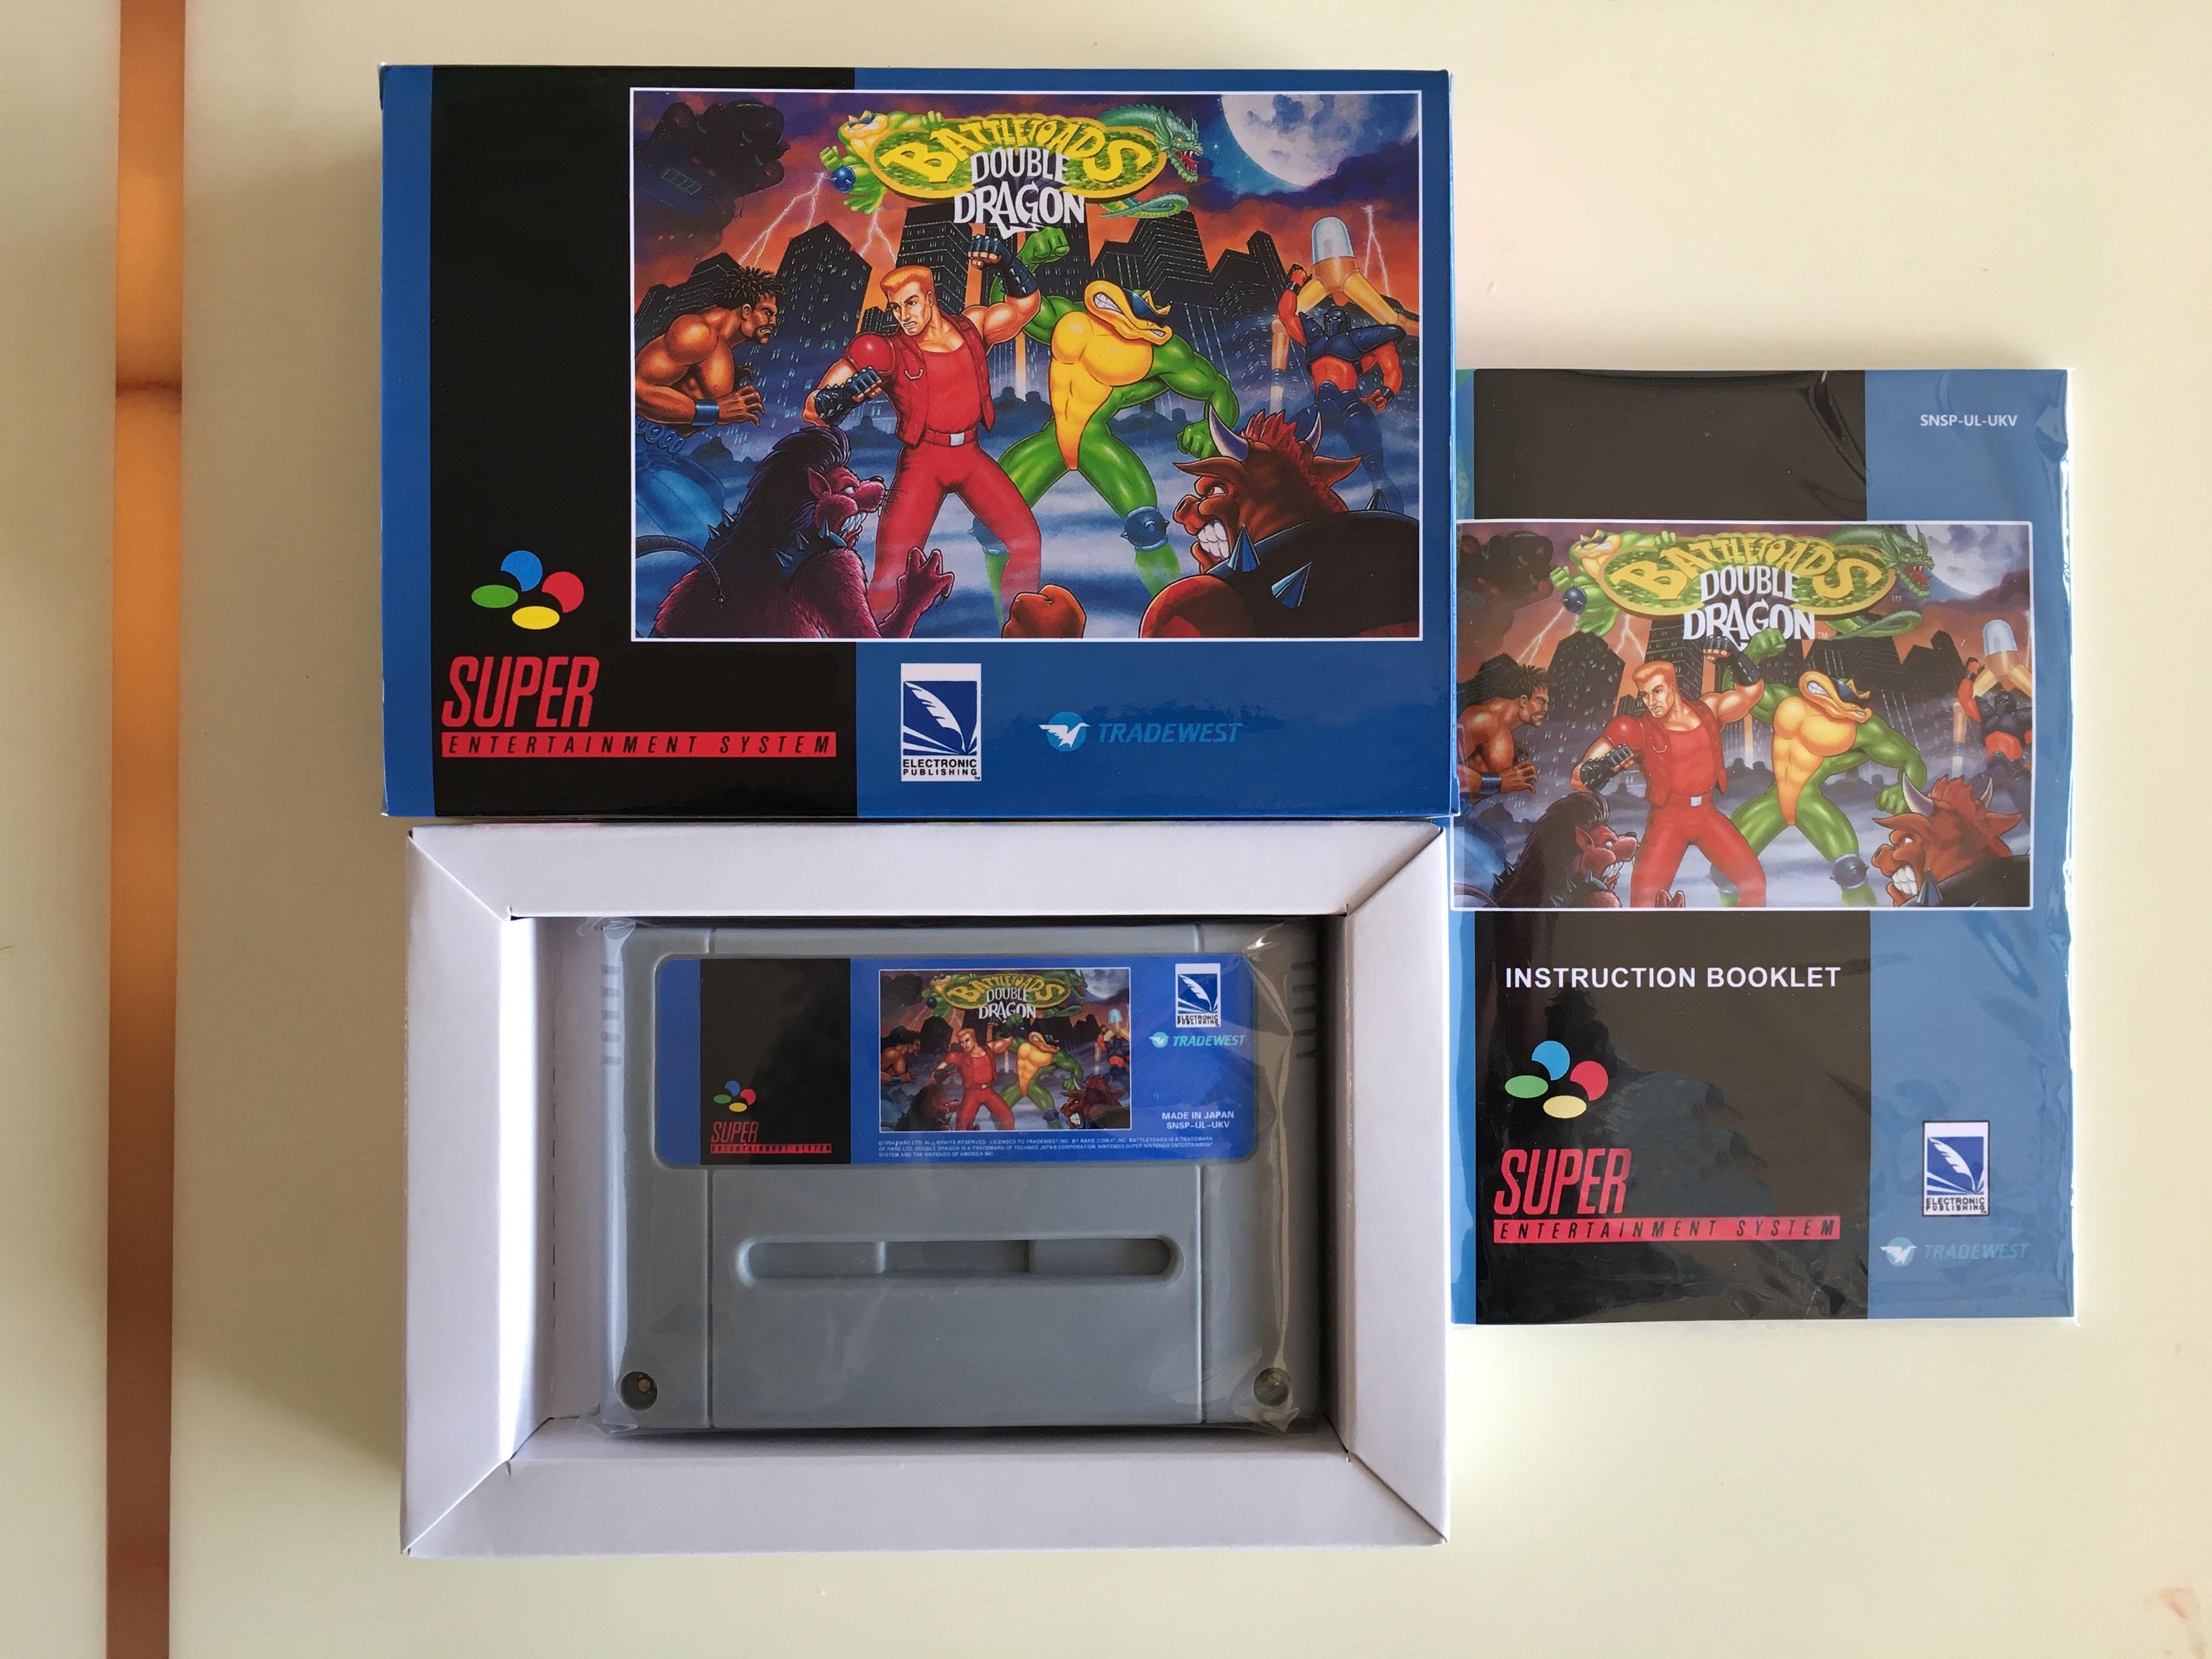 16Bit Games Battletoads Double Dragon UKV PAL Version Box Manual Cartridge